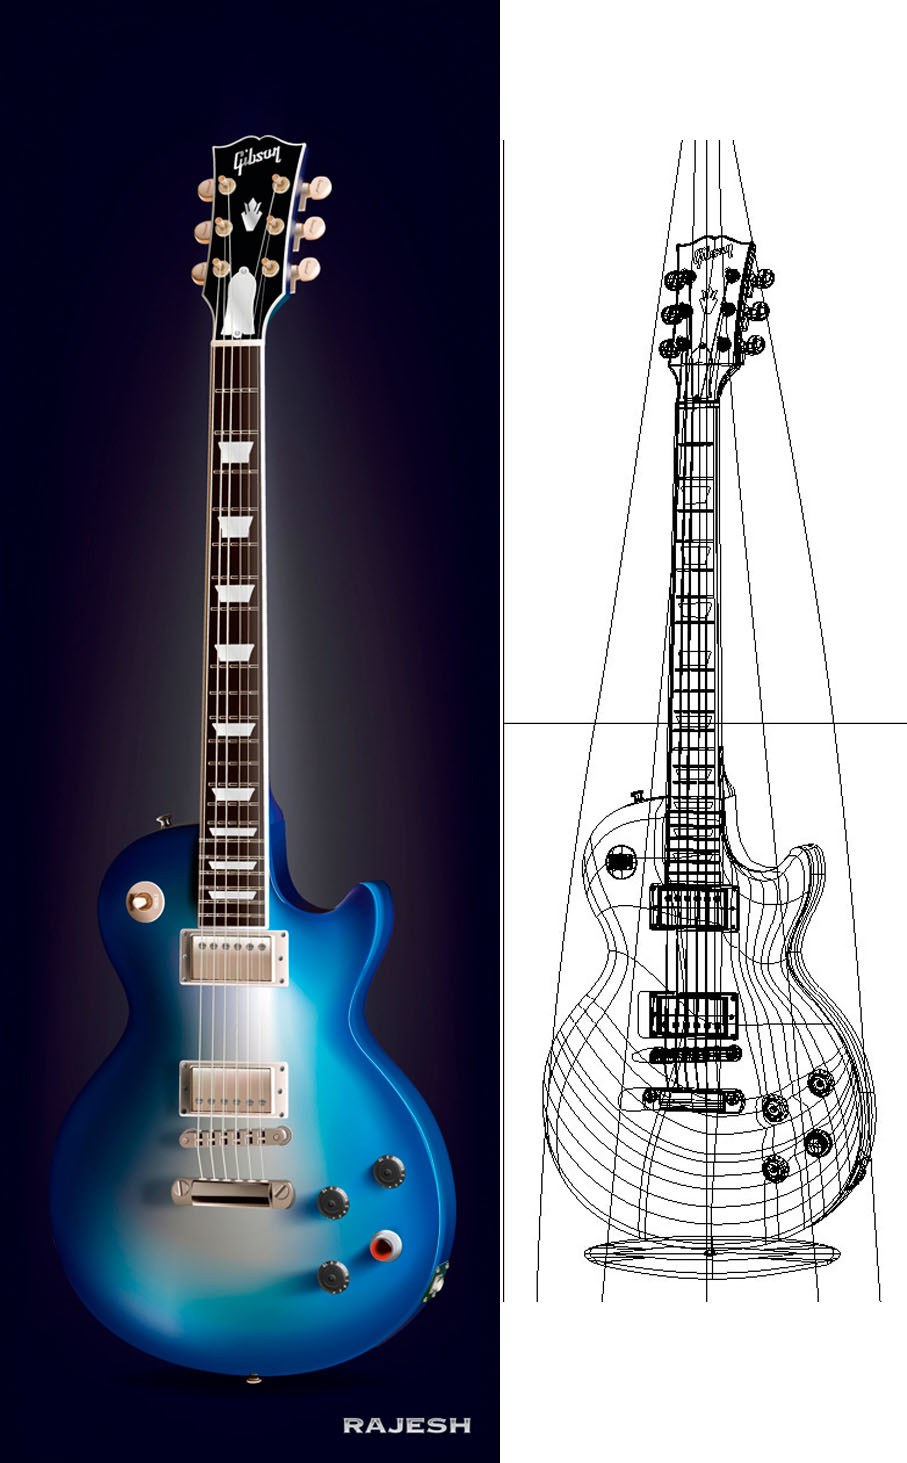 Rajesh sawant guitar iw